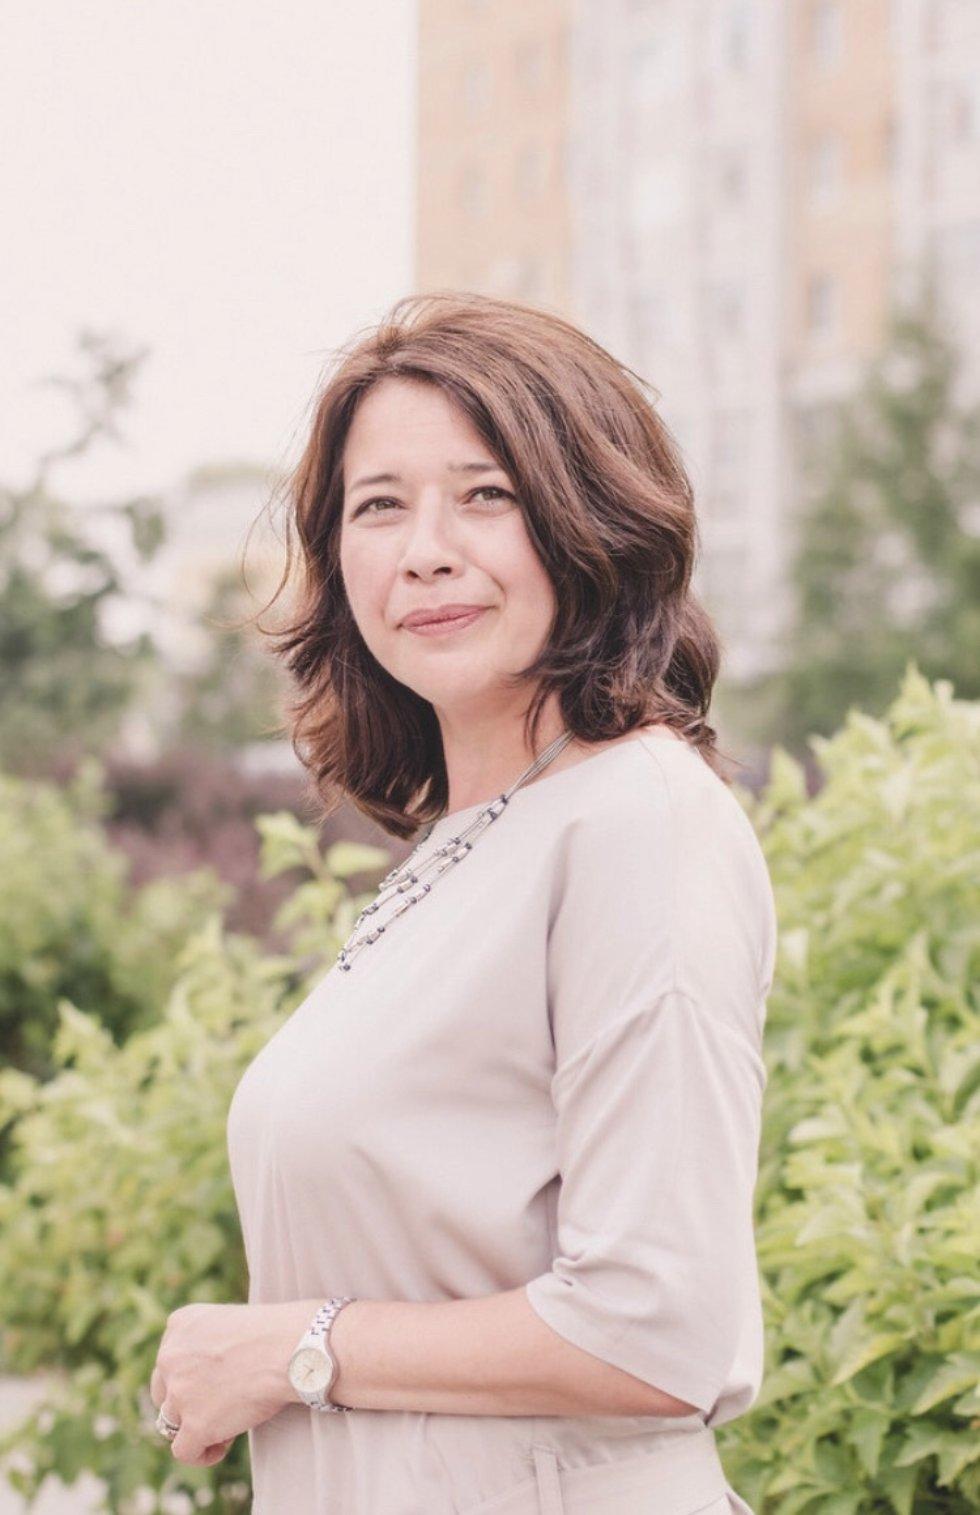 Григорьева Елена Валерьевна